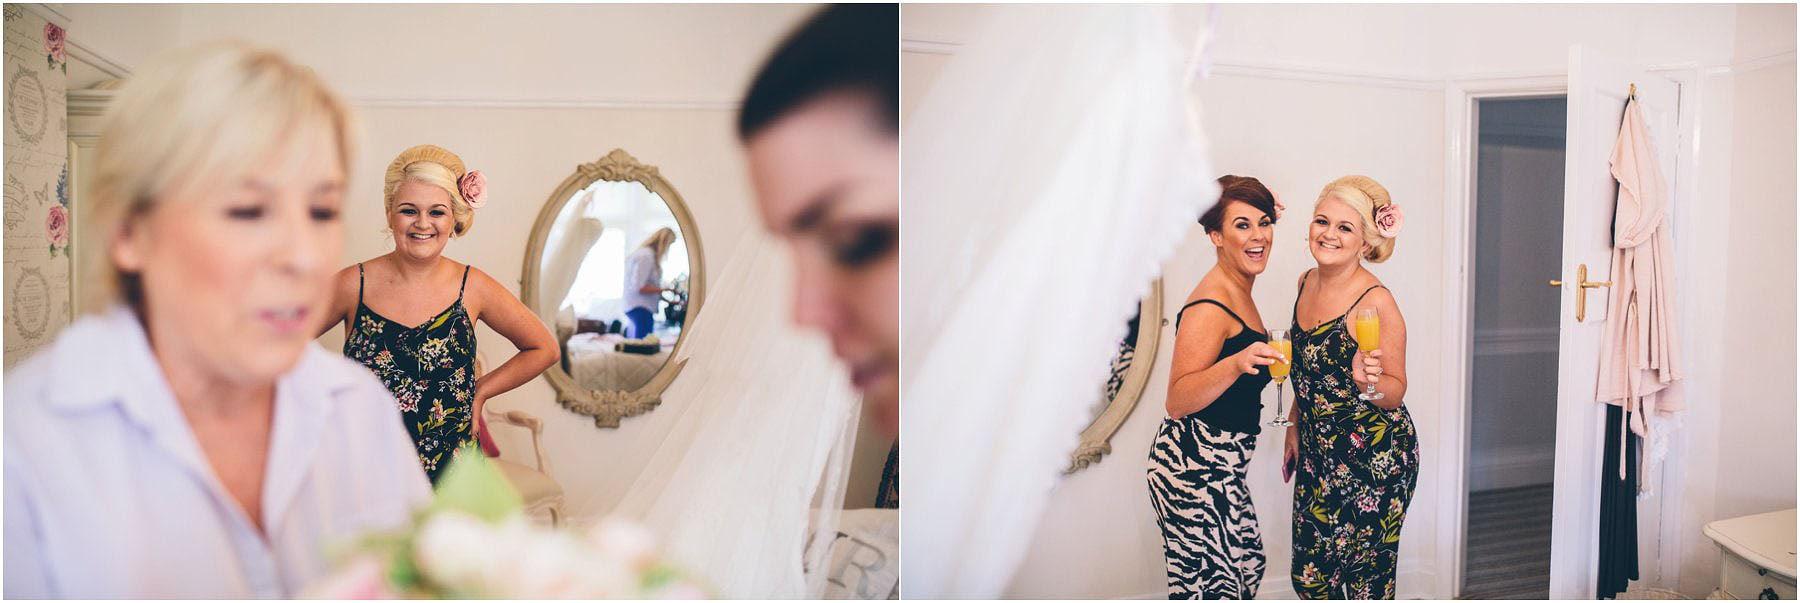 Soughton_Hall_Wedding_Photography_0004